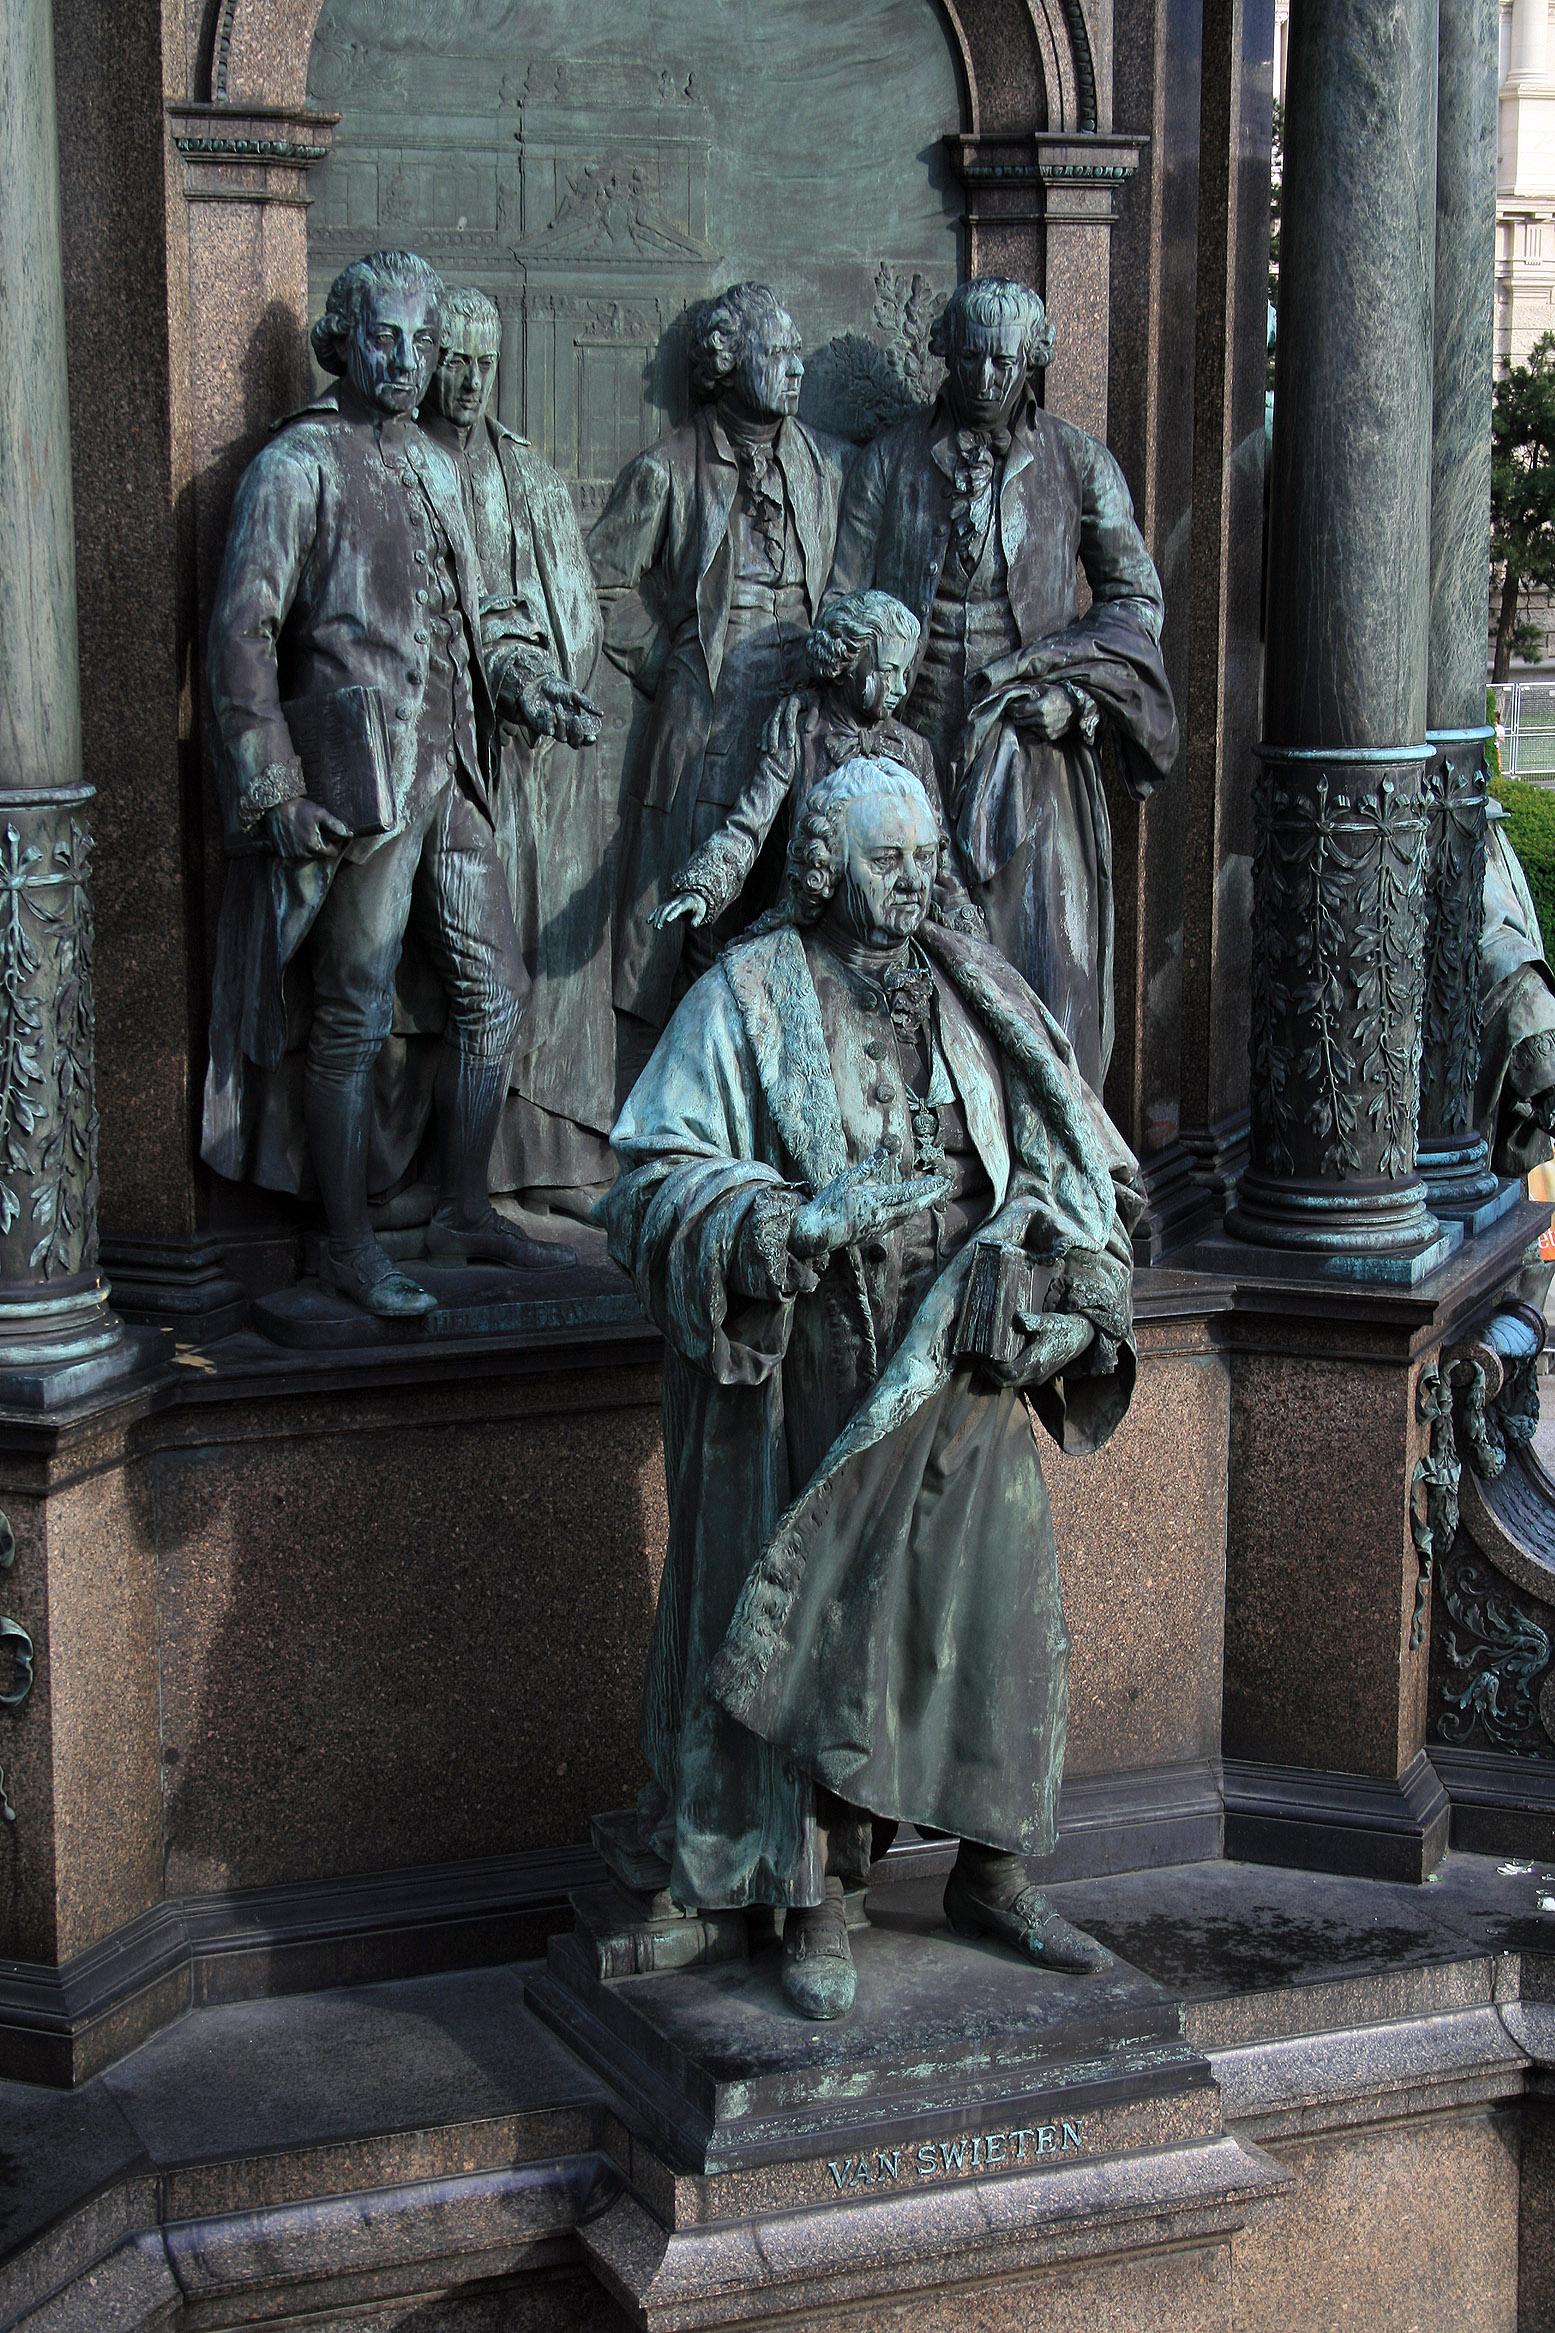 Maria-Theresien-Denkmal Wien - van Swieten, Eckhel, Pray Gluck, Haydn, Mozart 2008.jpg